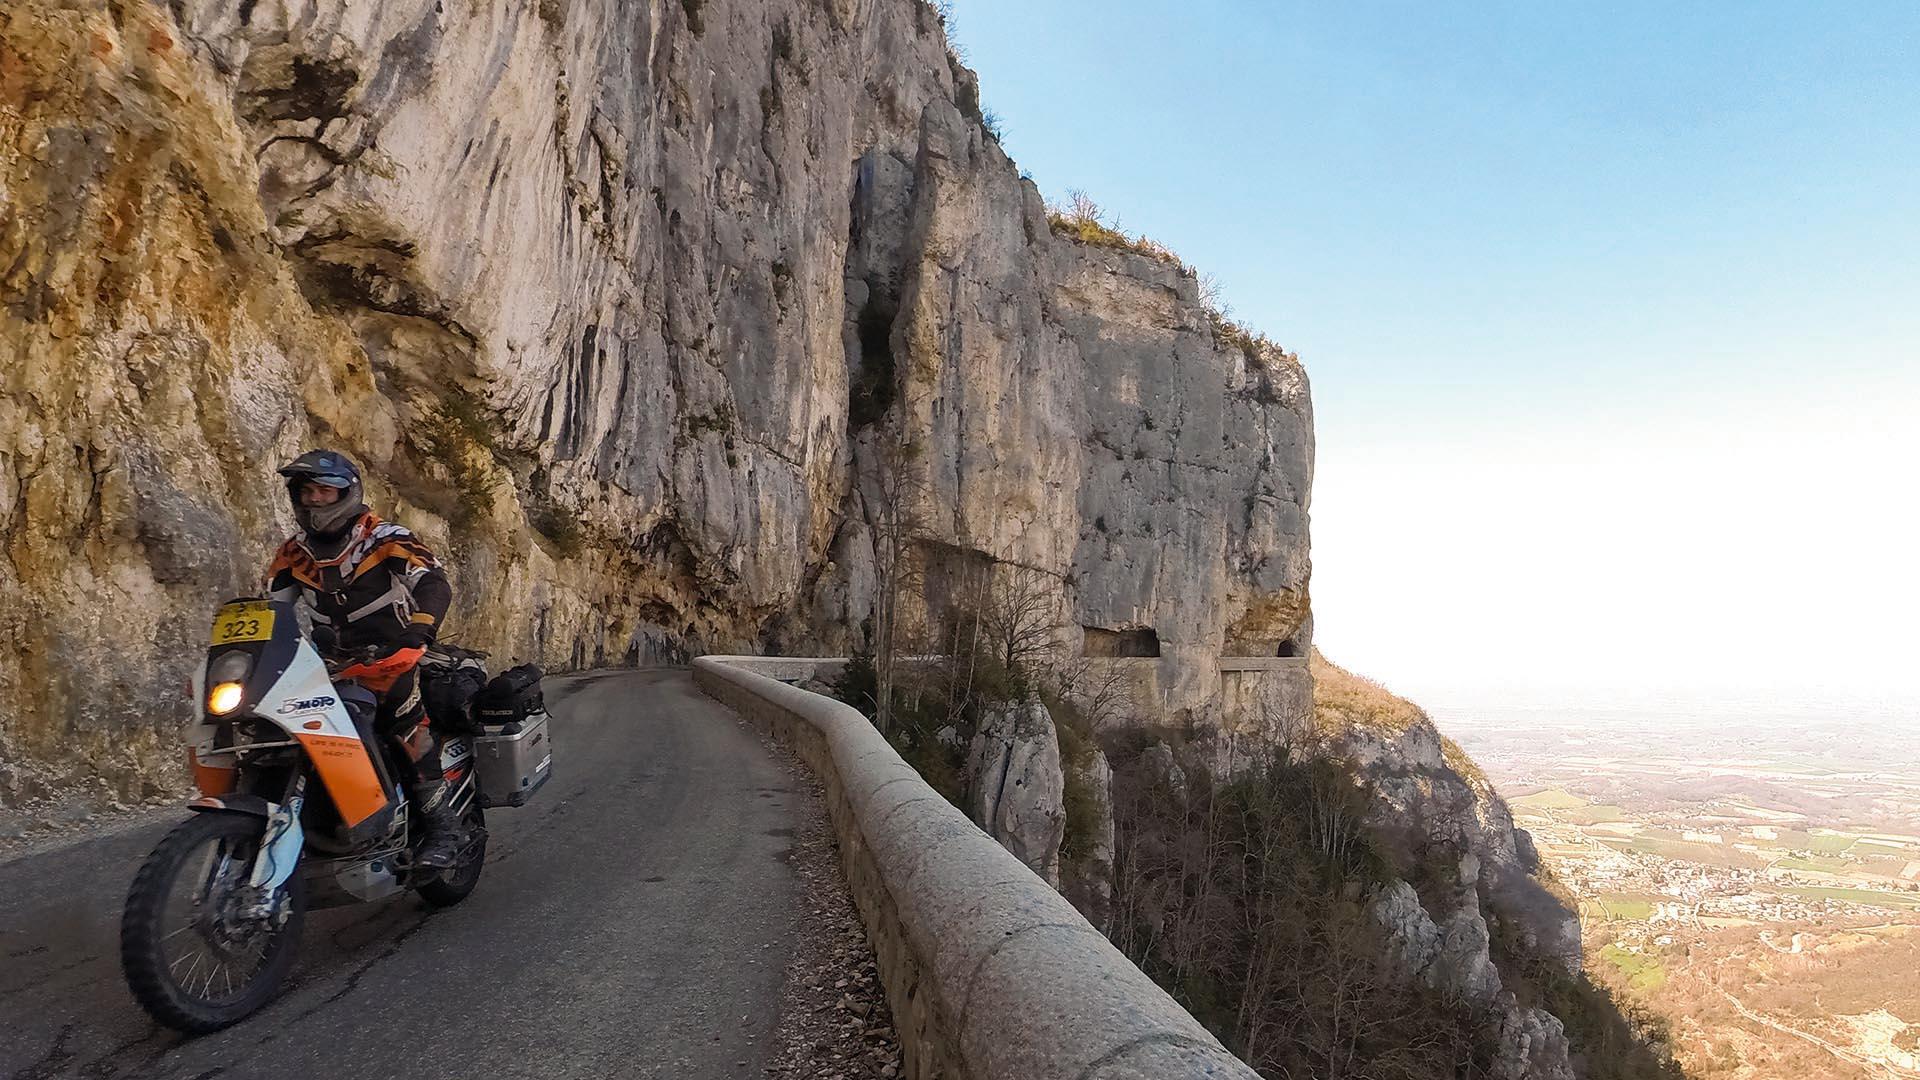 Berauschend vielseitig - Cevennen-Ardèche